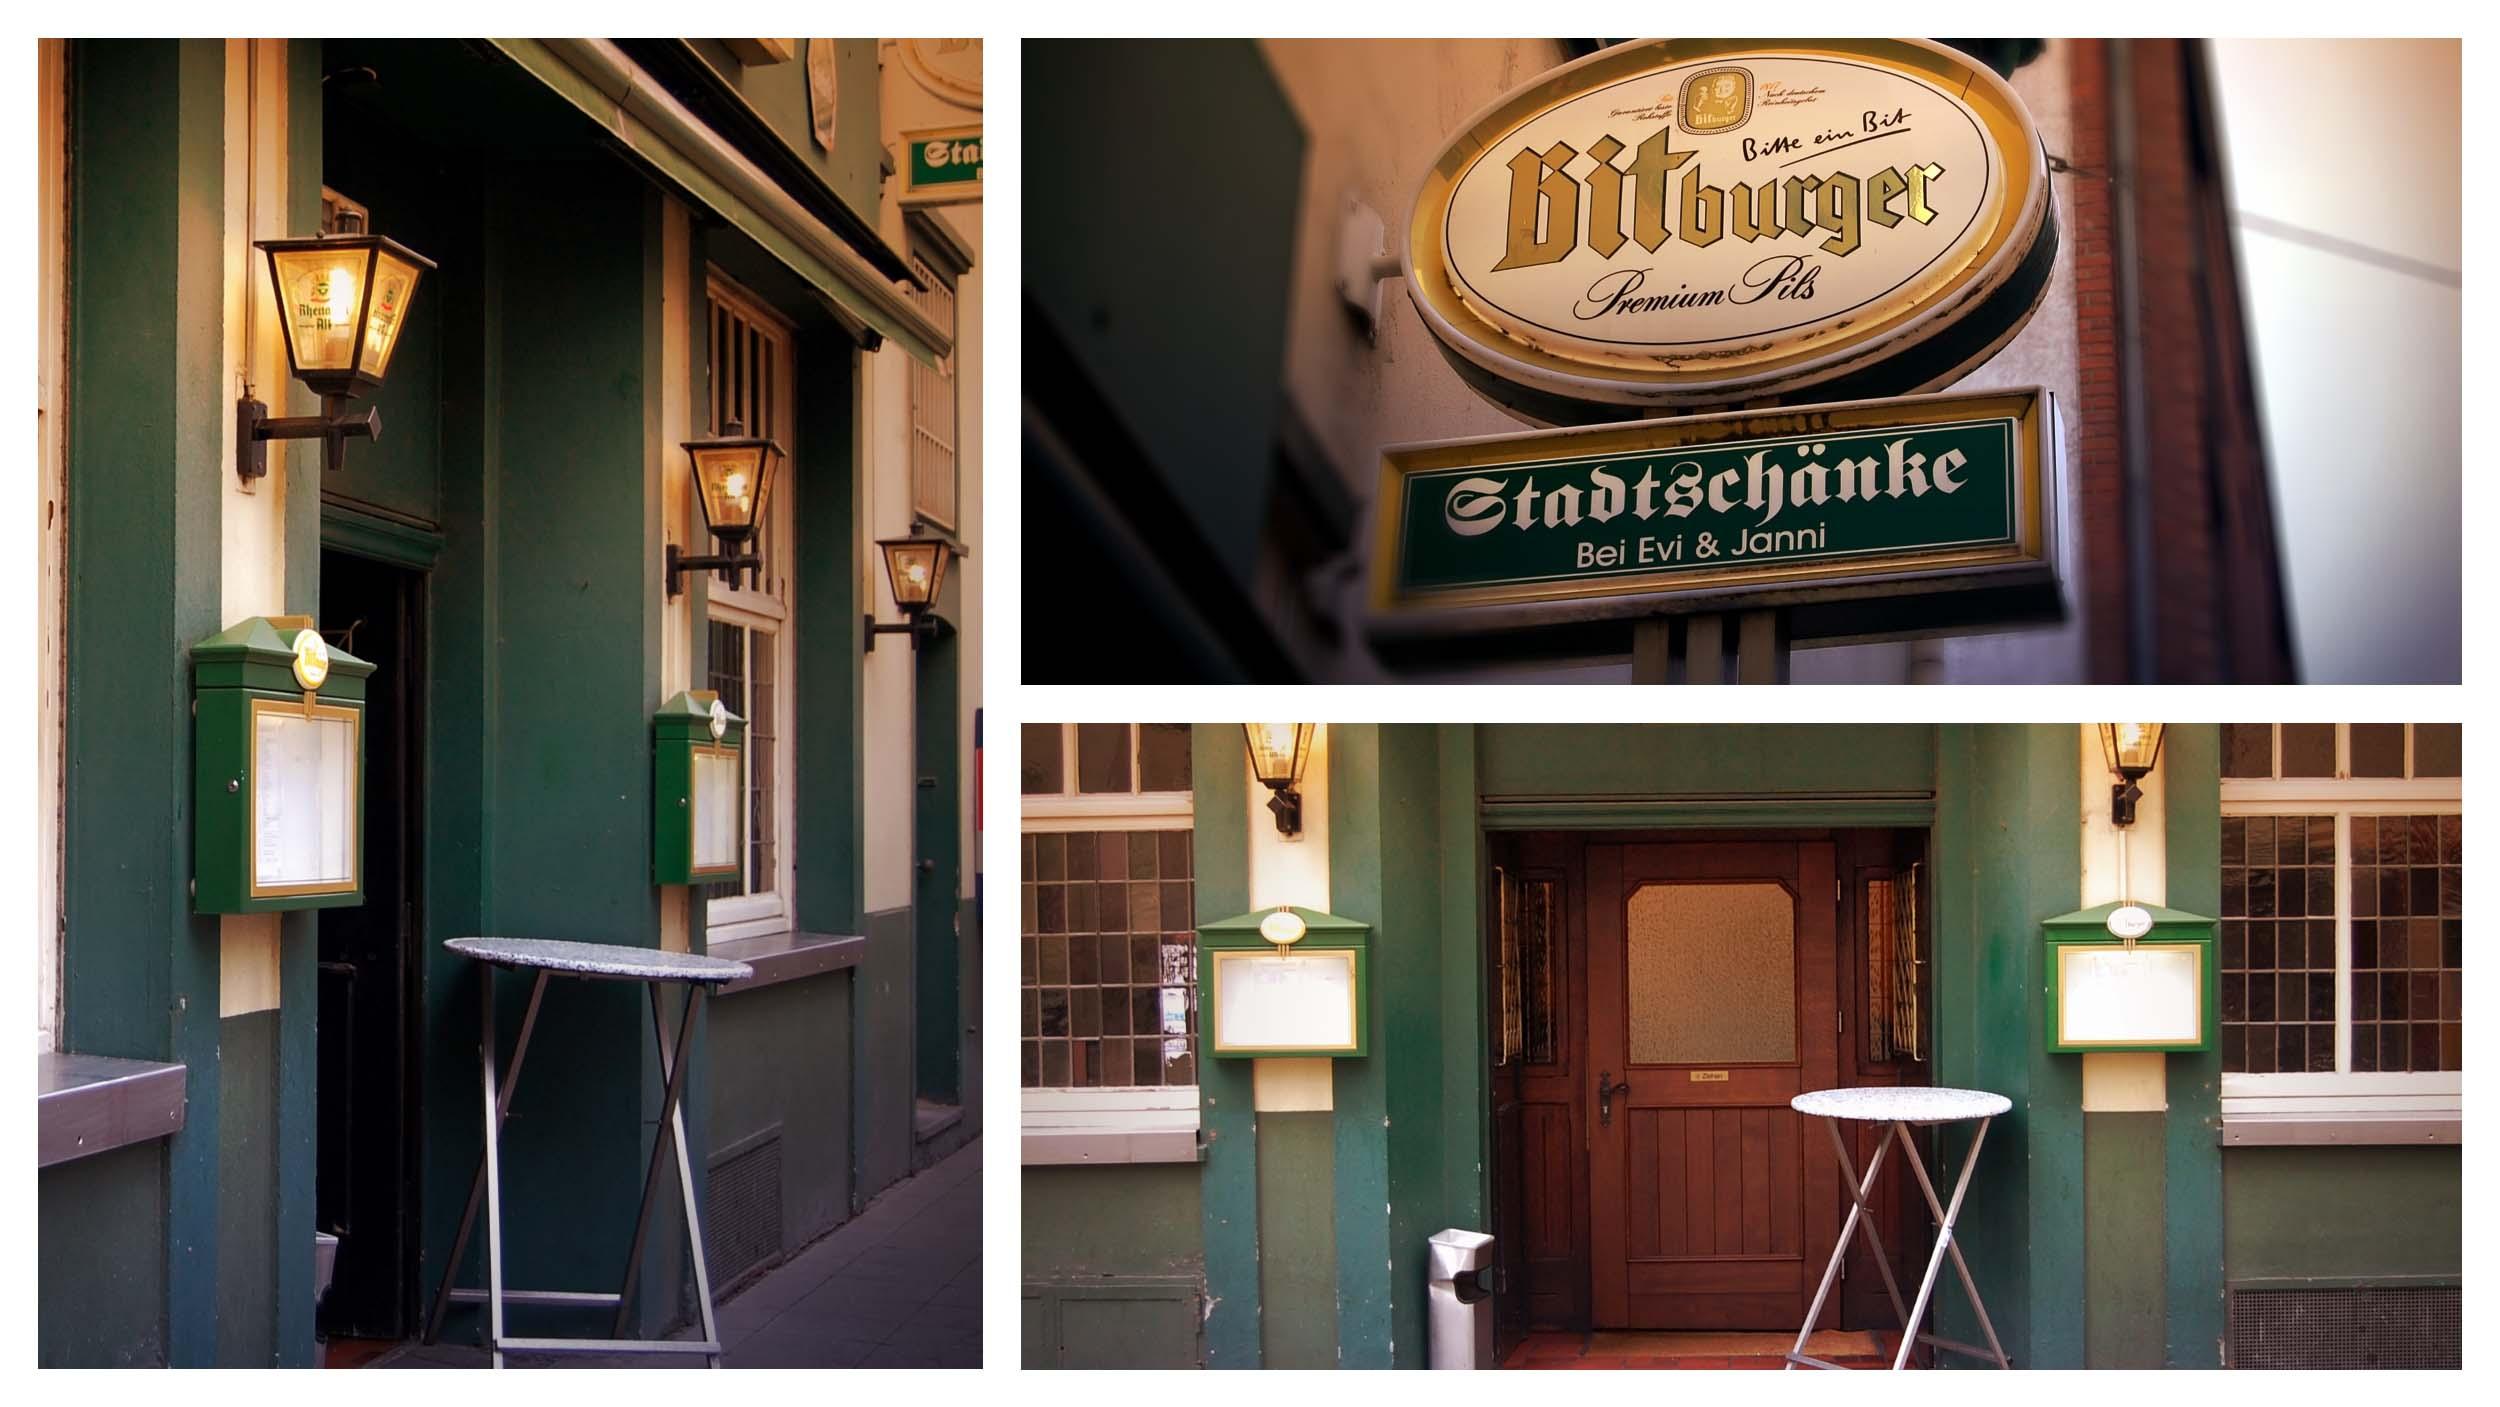 Stadtschänke Krefeld - Bei Evi & Janni